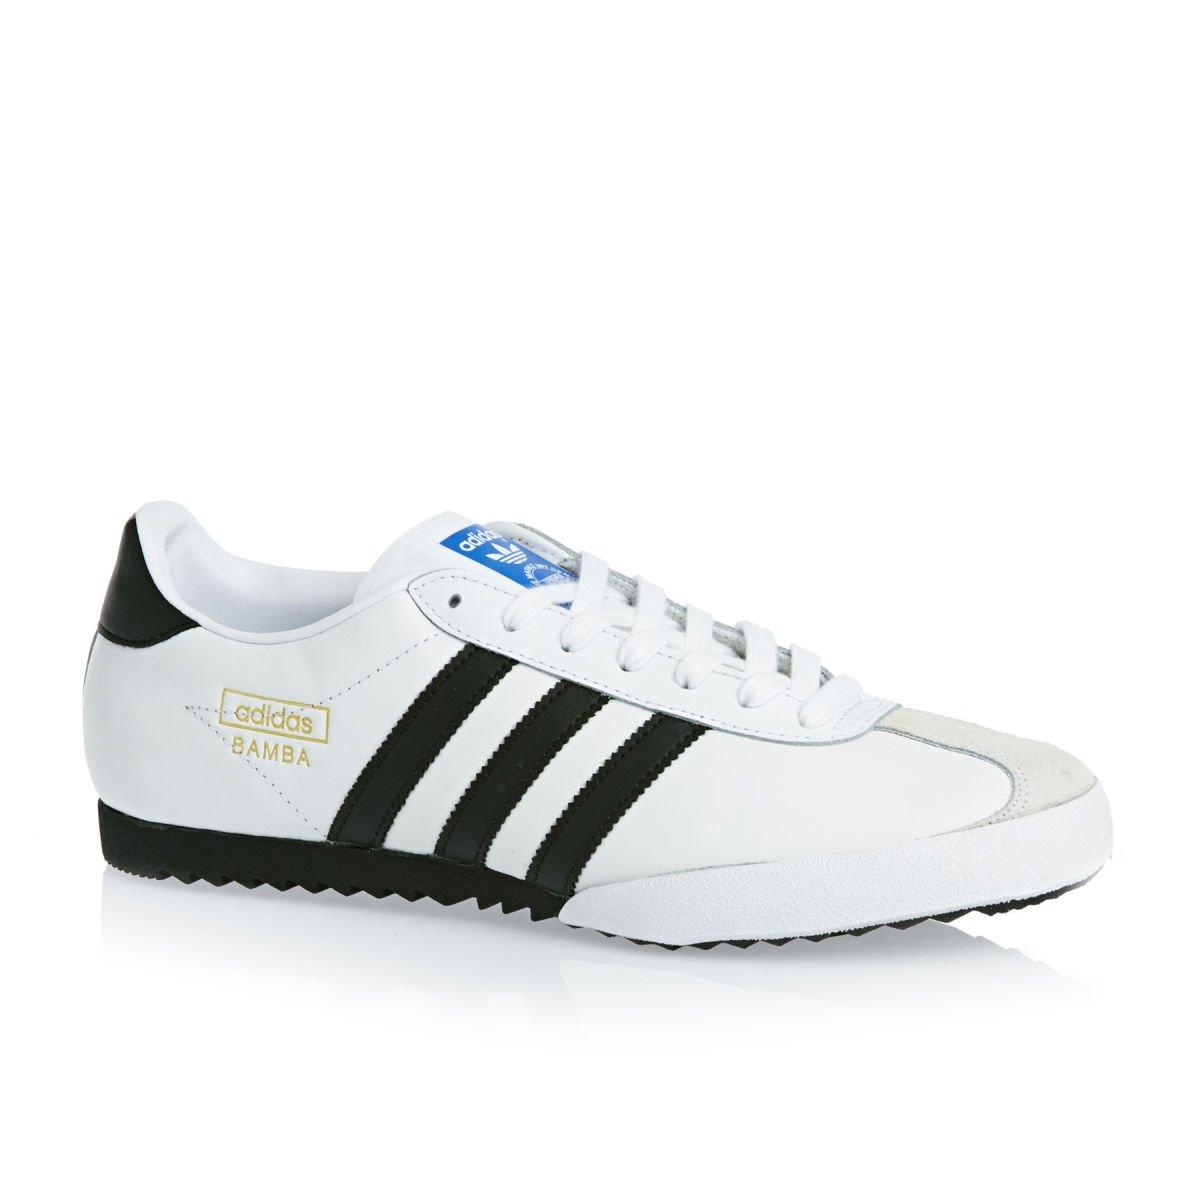 adidas originals mens bamba trainers 48b21c